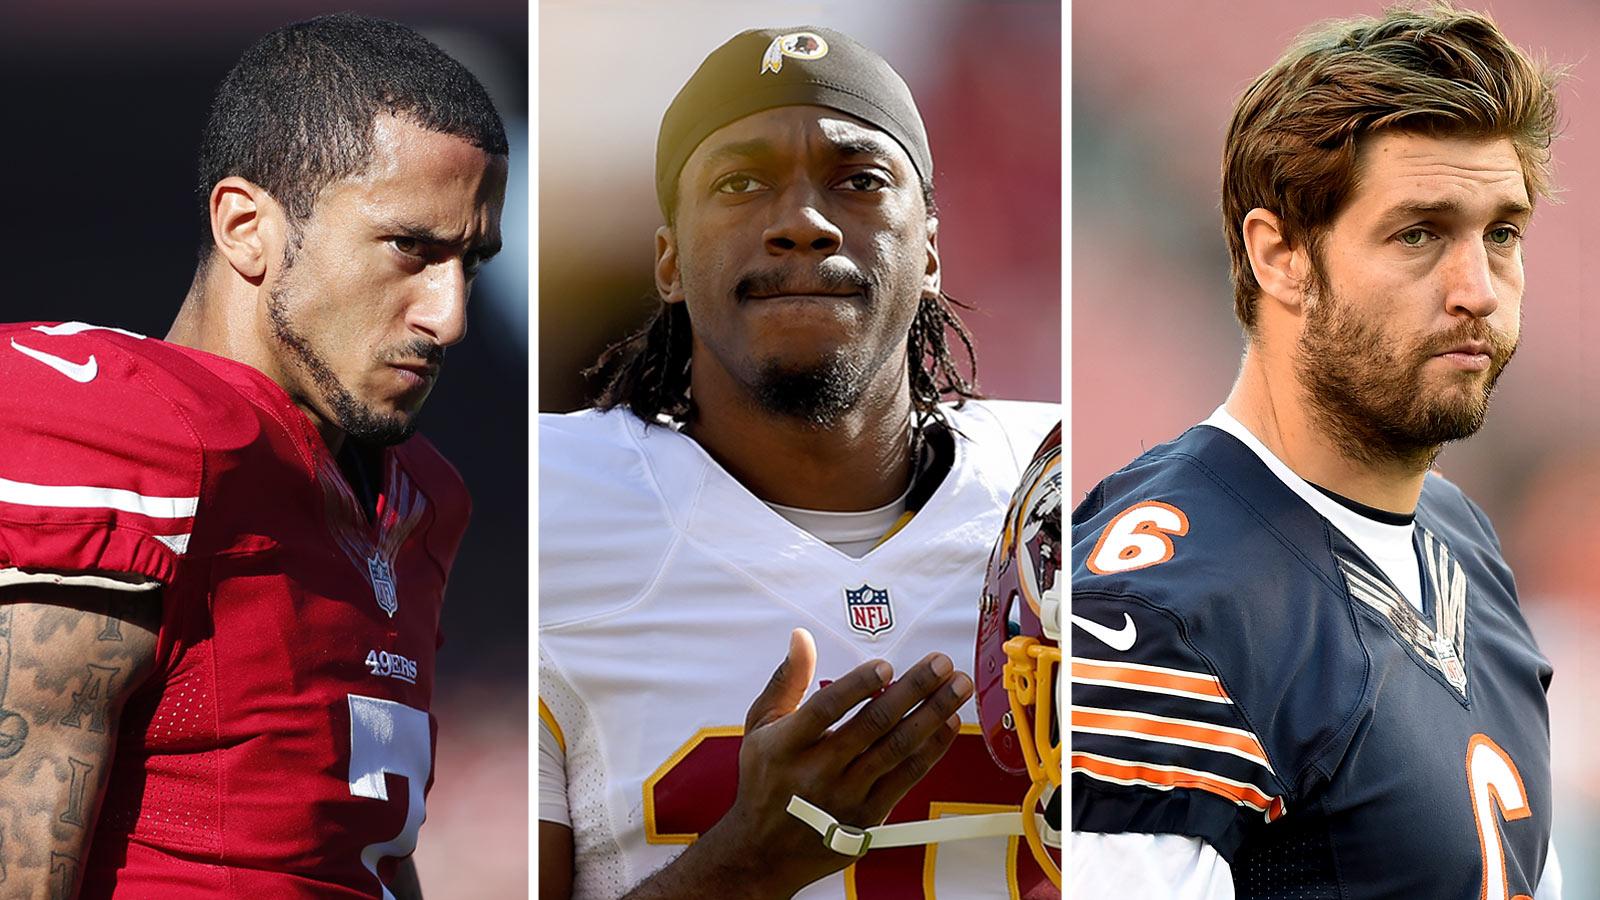 121714-NFL-SF-Colin-Kaepernick-Redskins-Robert-Griffin-Bears-Jay-Cutler-JL-PI